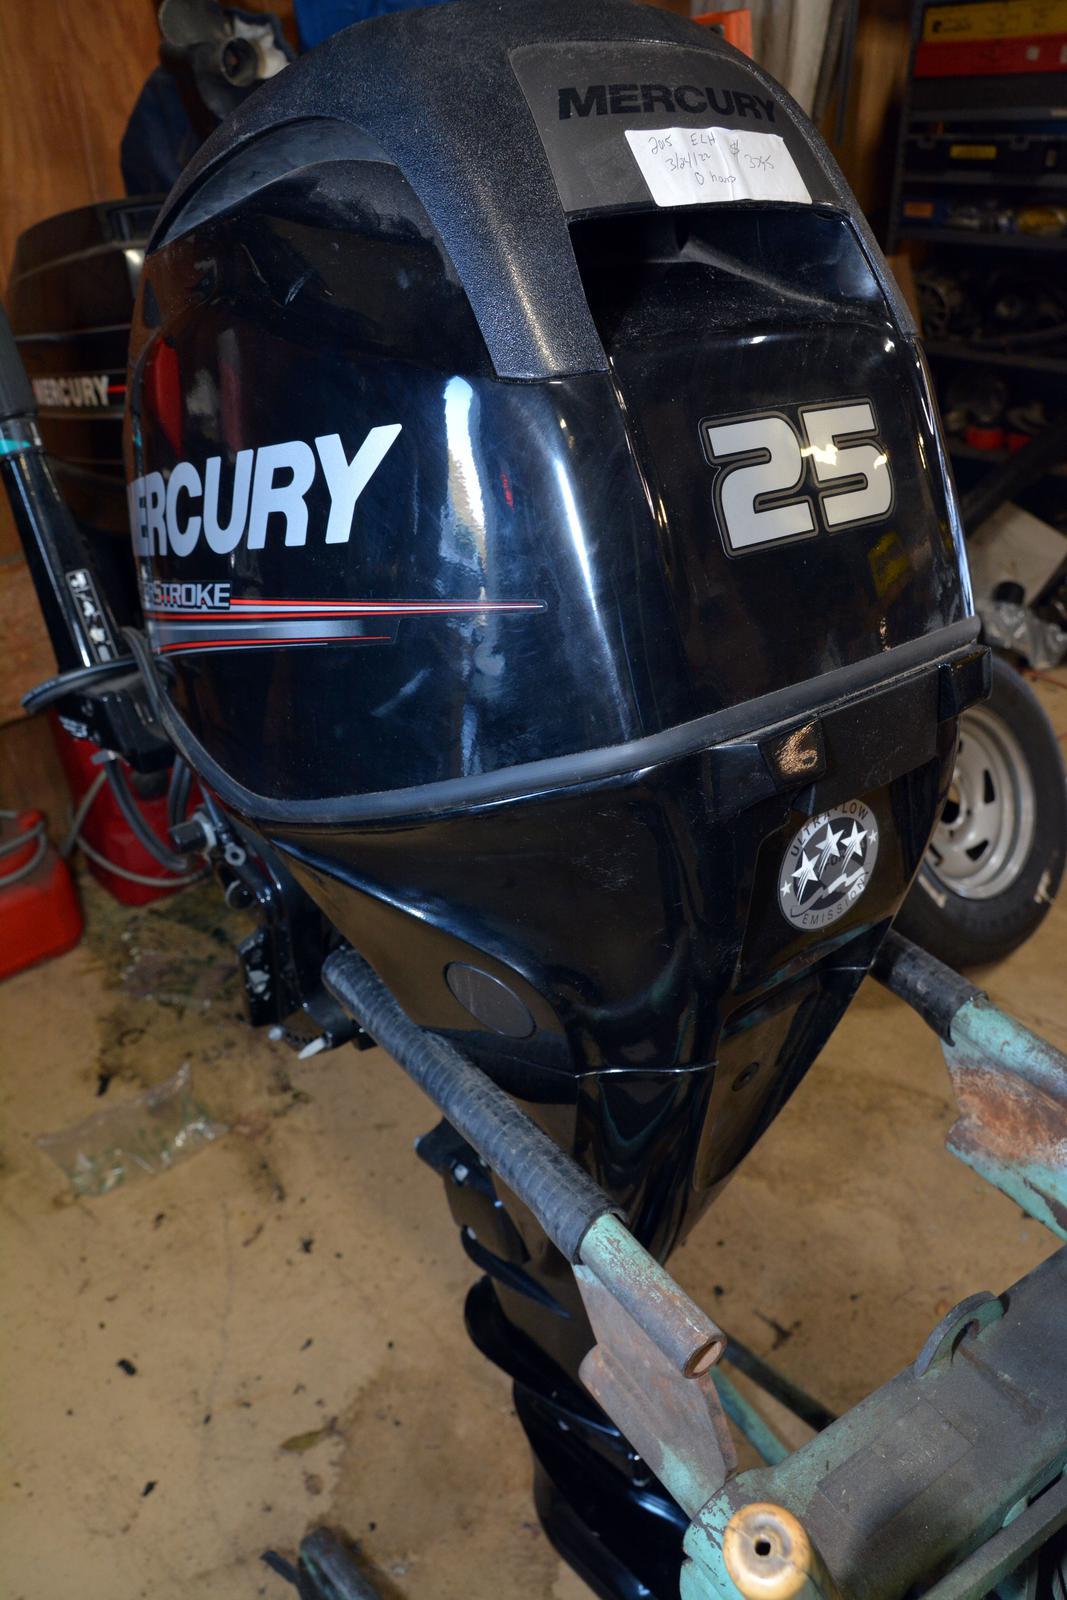 2015 Mercury FourStroke 25 HP EFI - 20 in  Shaft